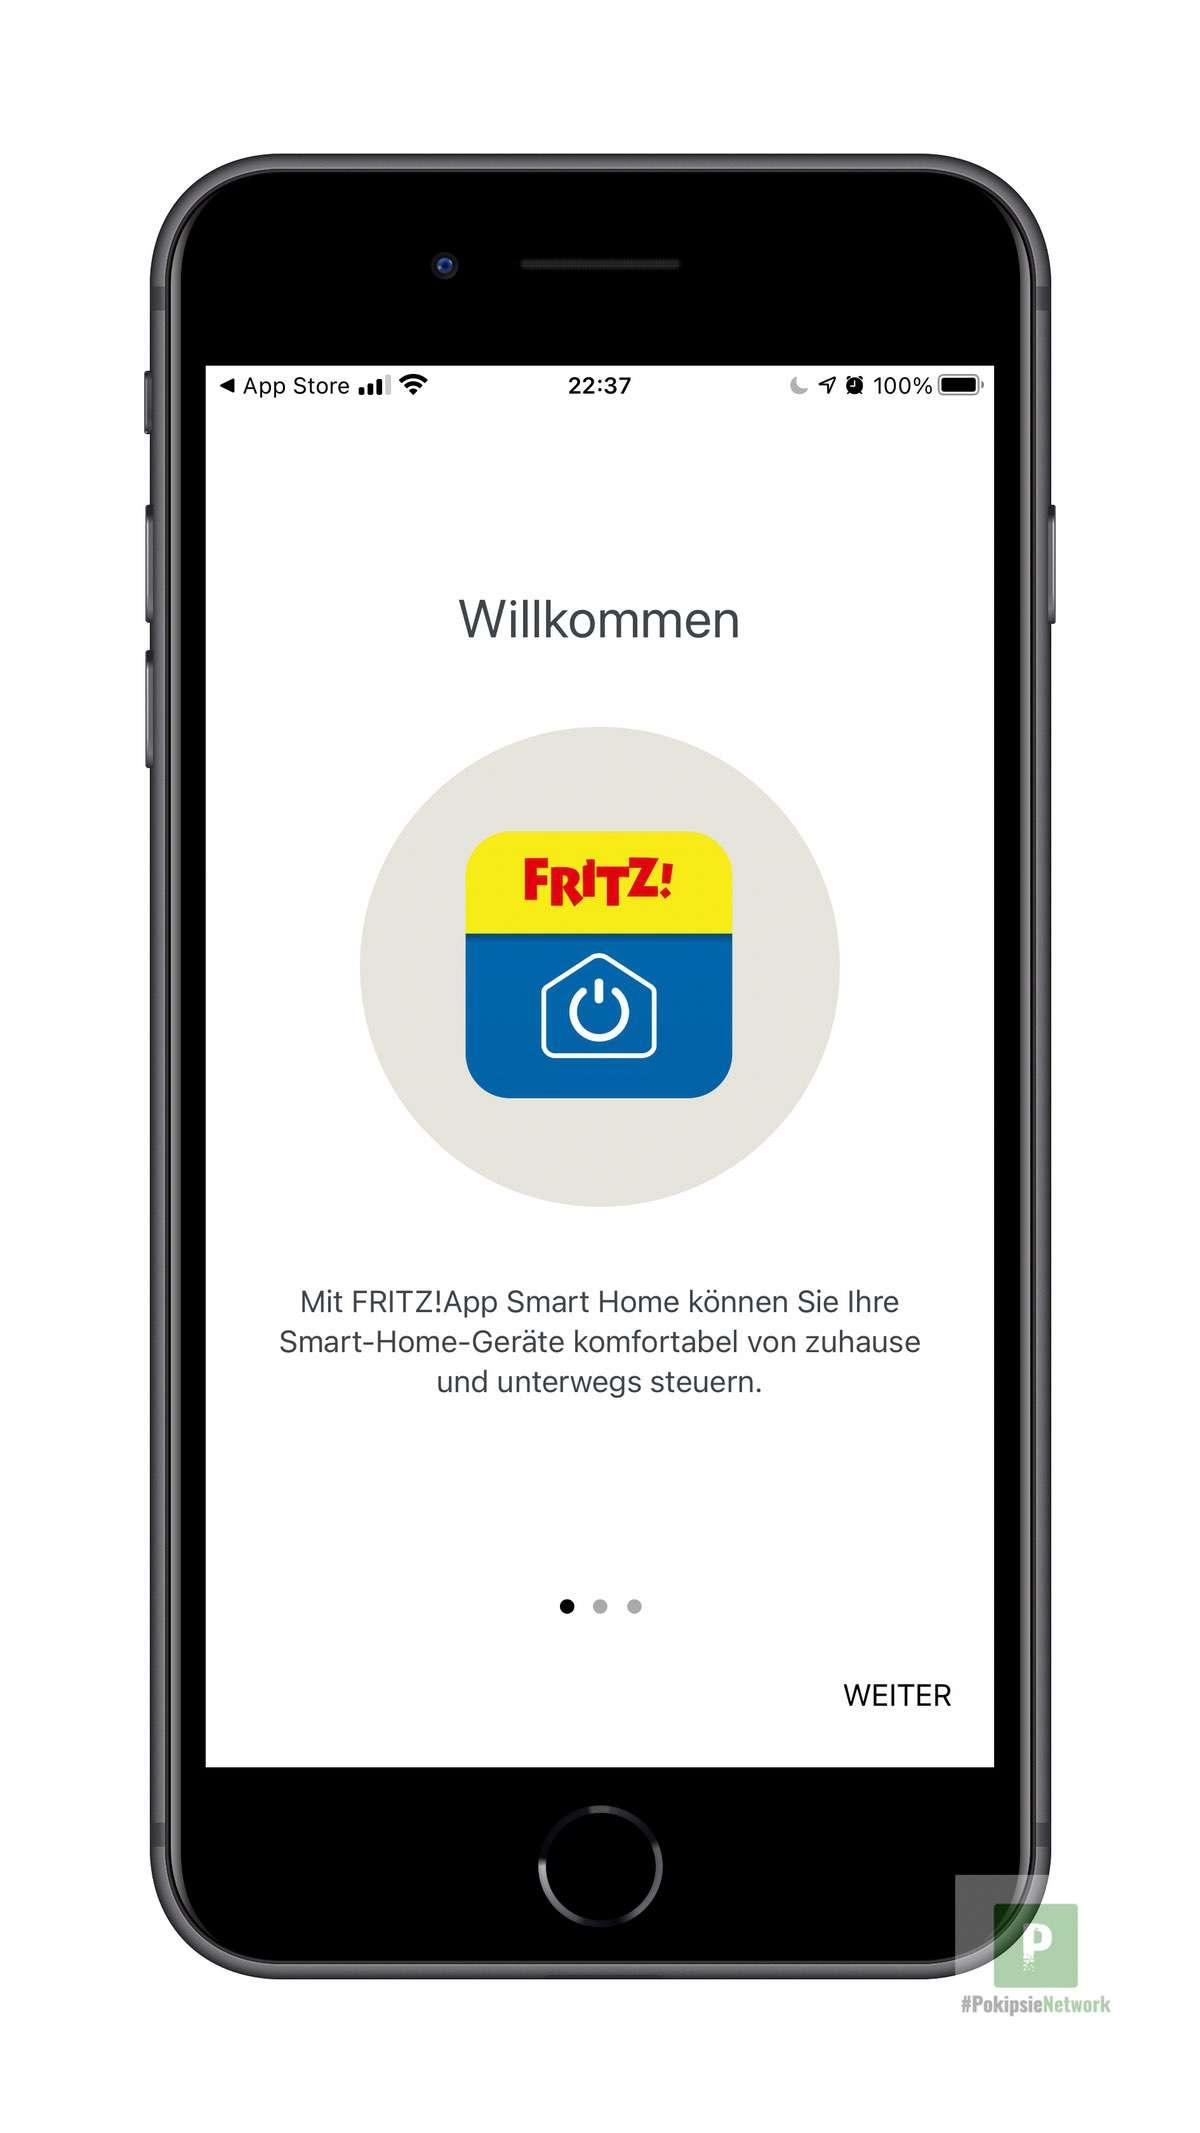 Willkommen bei FRITZ!App Smart Home